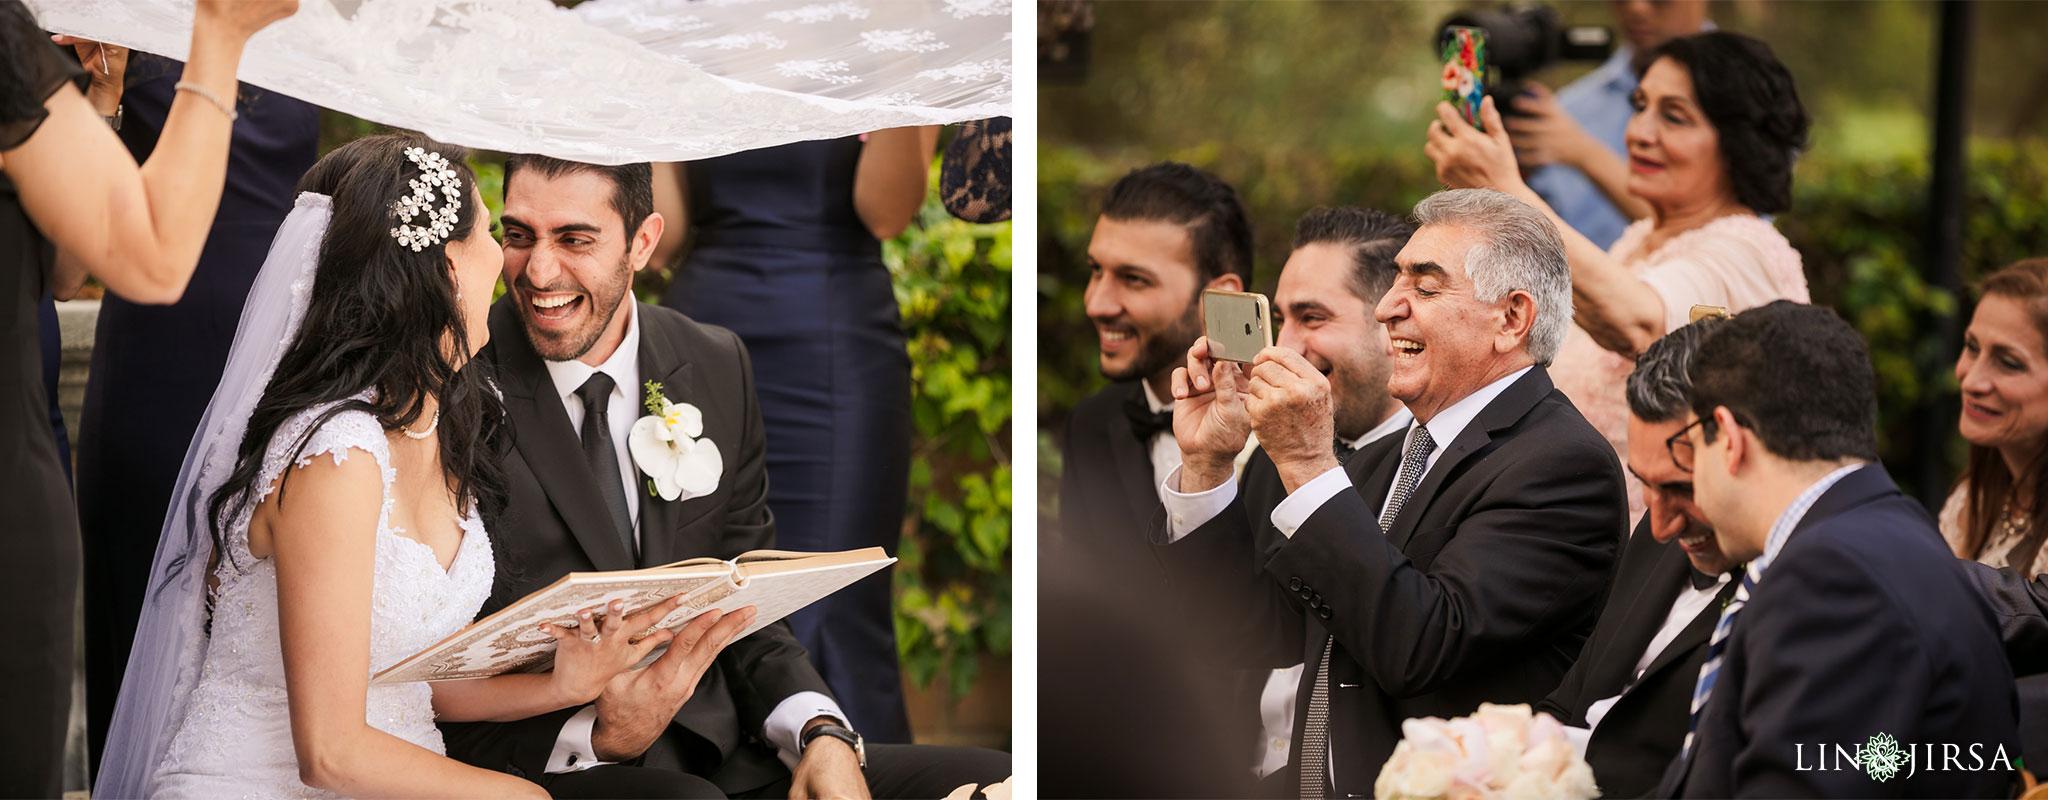 032 estancia la jolla hotel spa persian sofreh wedding ceremony photography